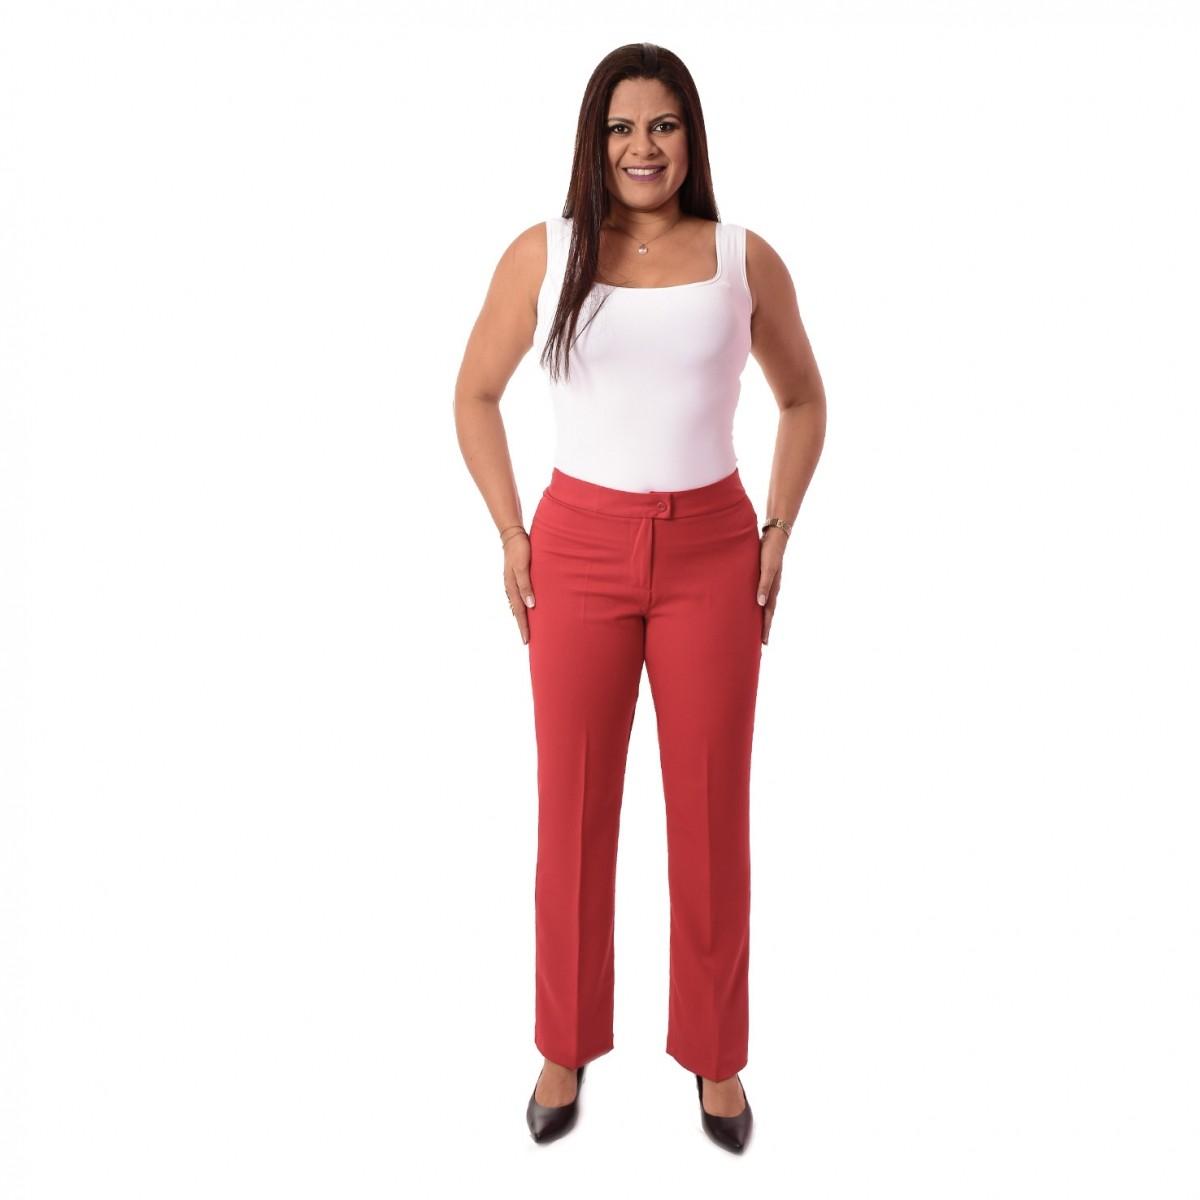 Calça Social Feminina Longa - Vermelha